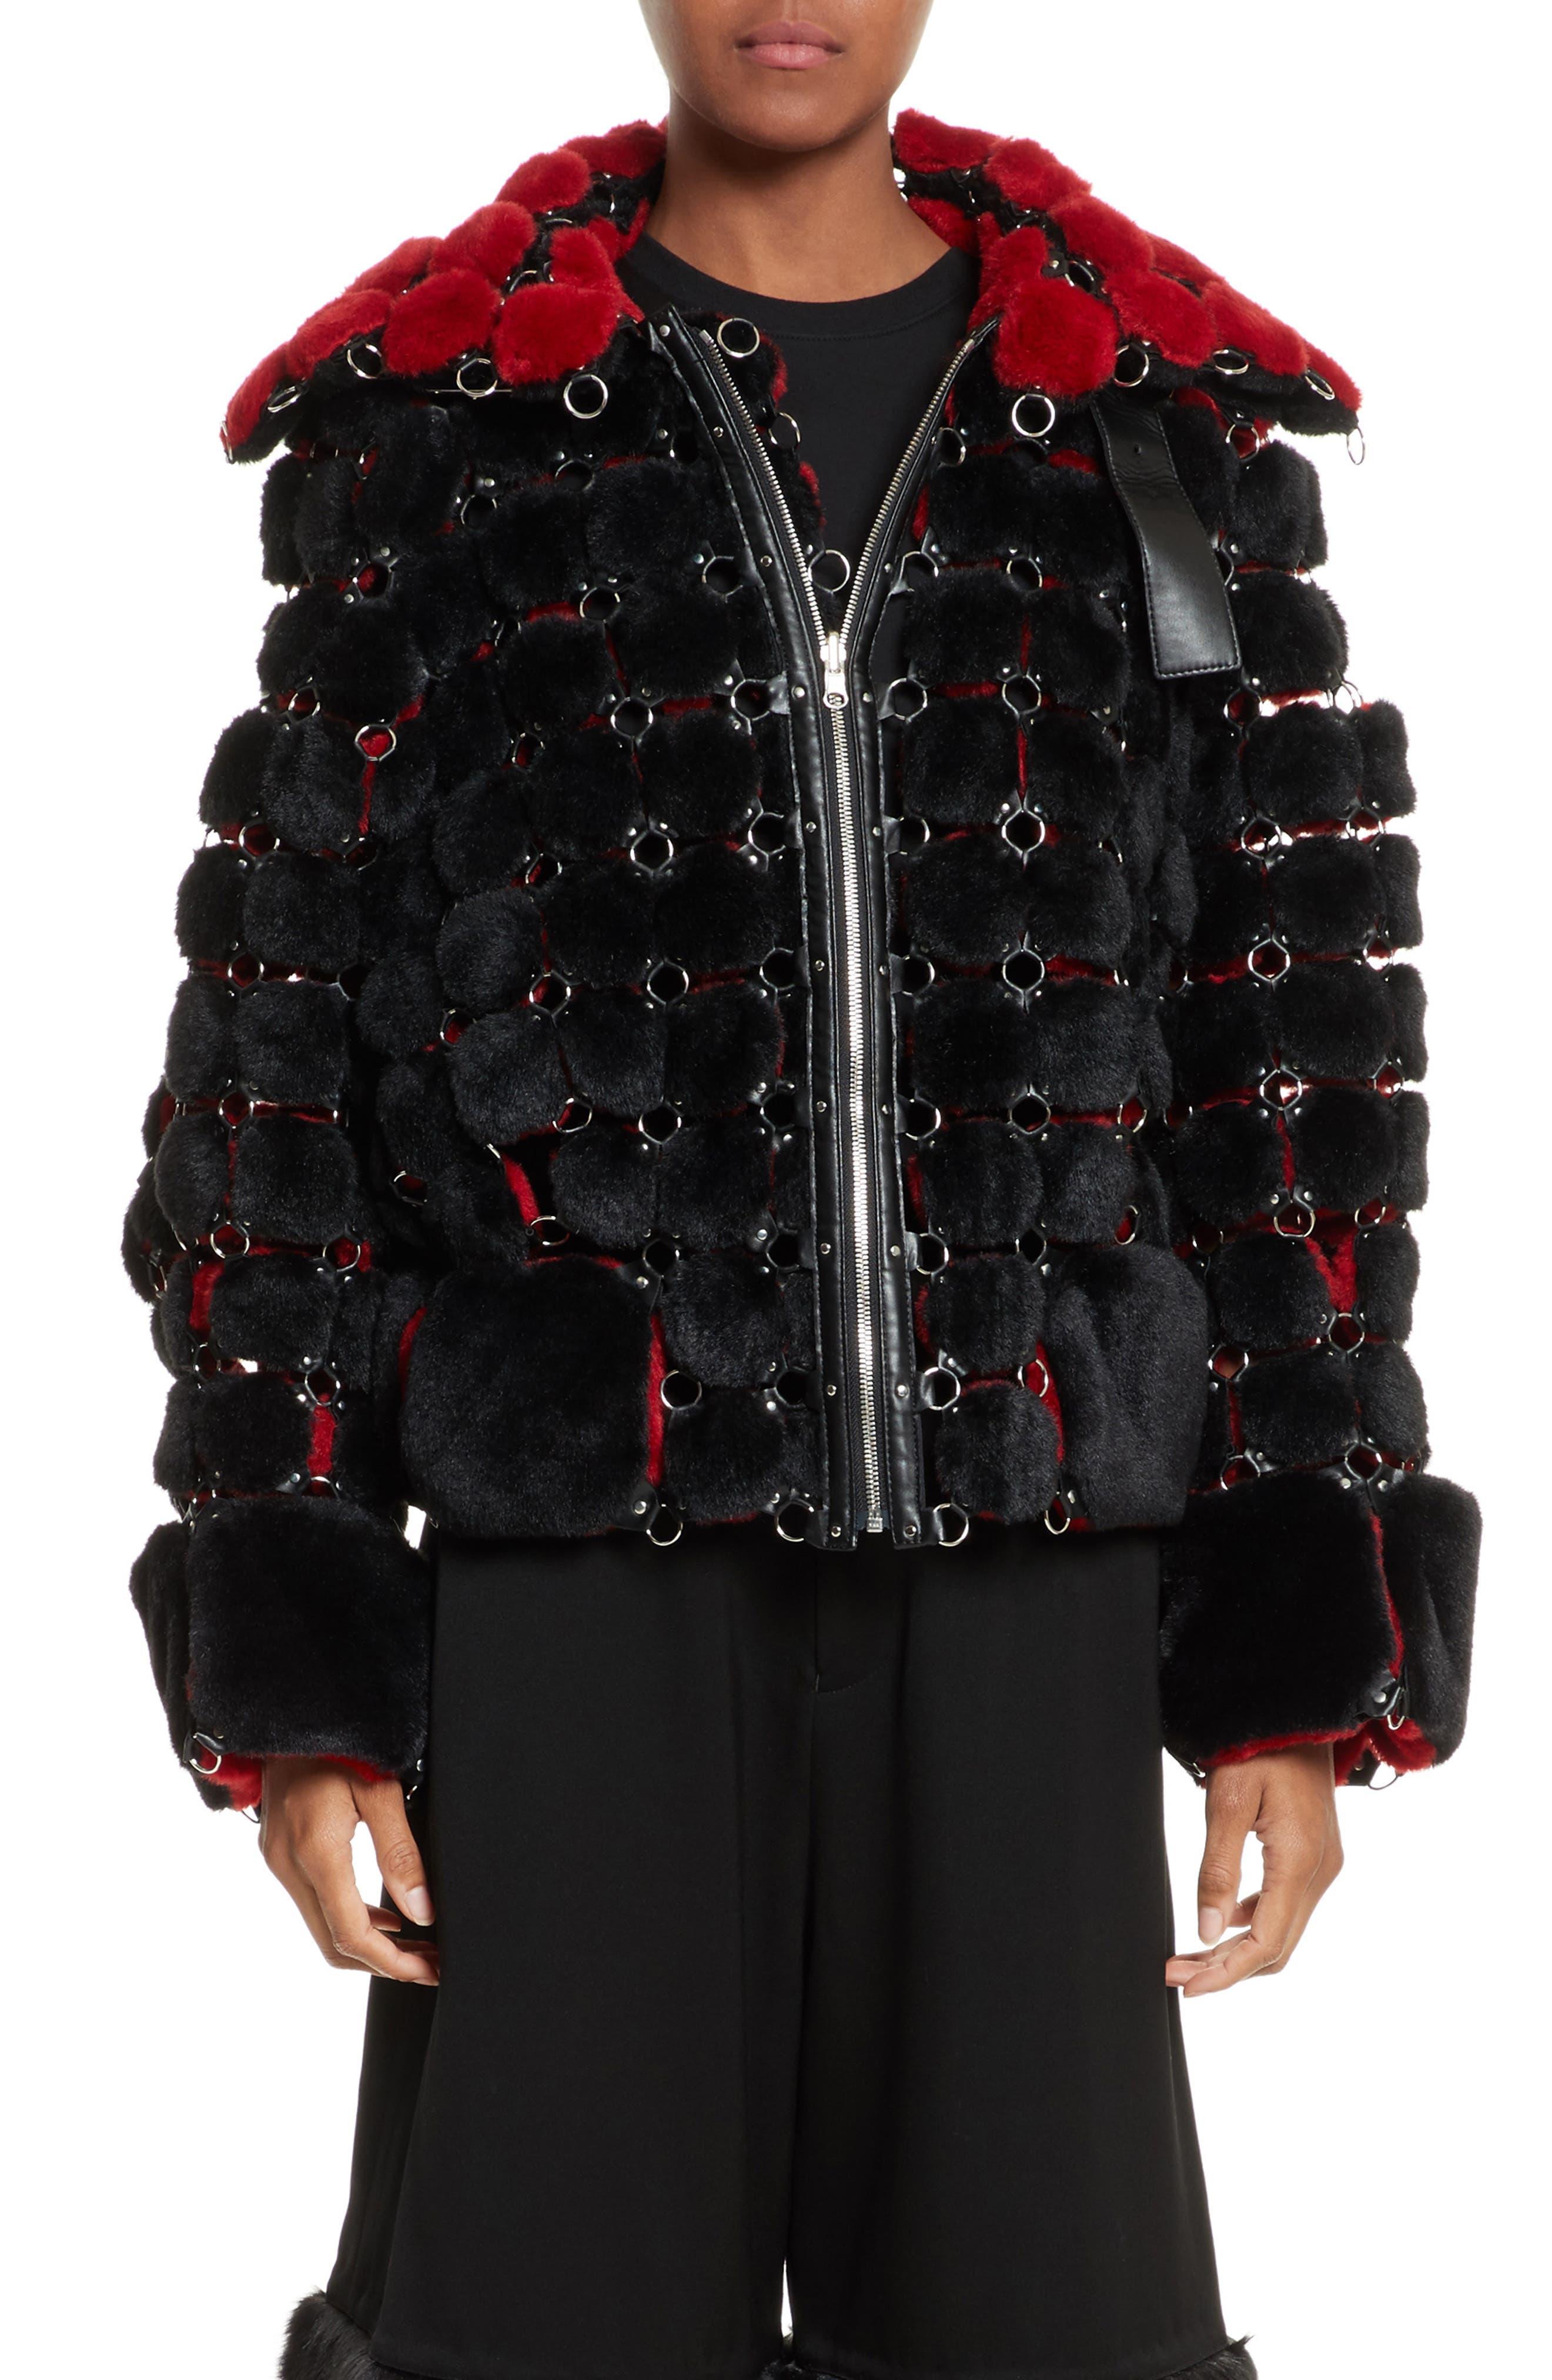 noir kei ninomiya Faux Fur Jacket with Chain Mail Detail